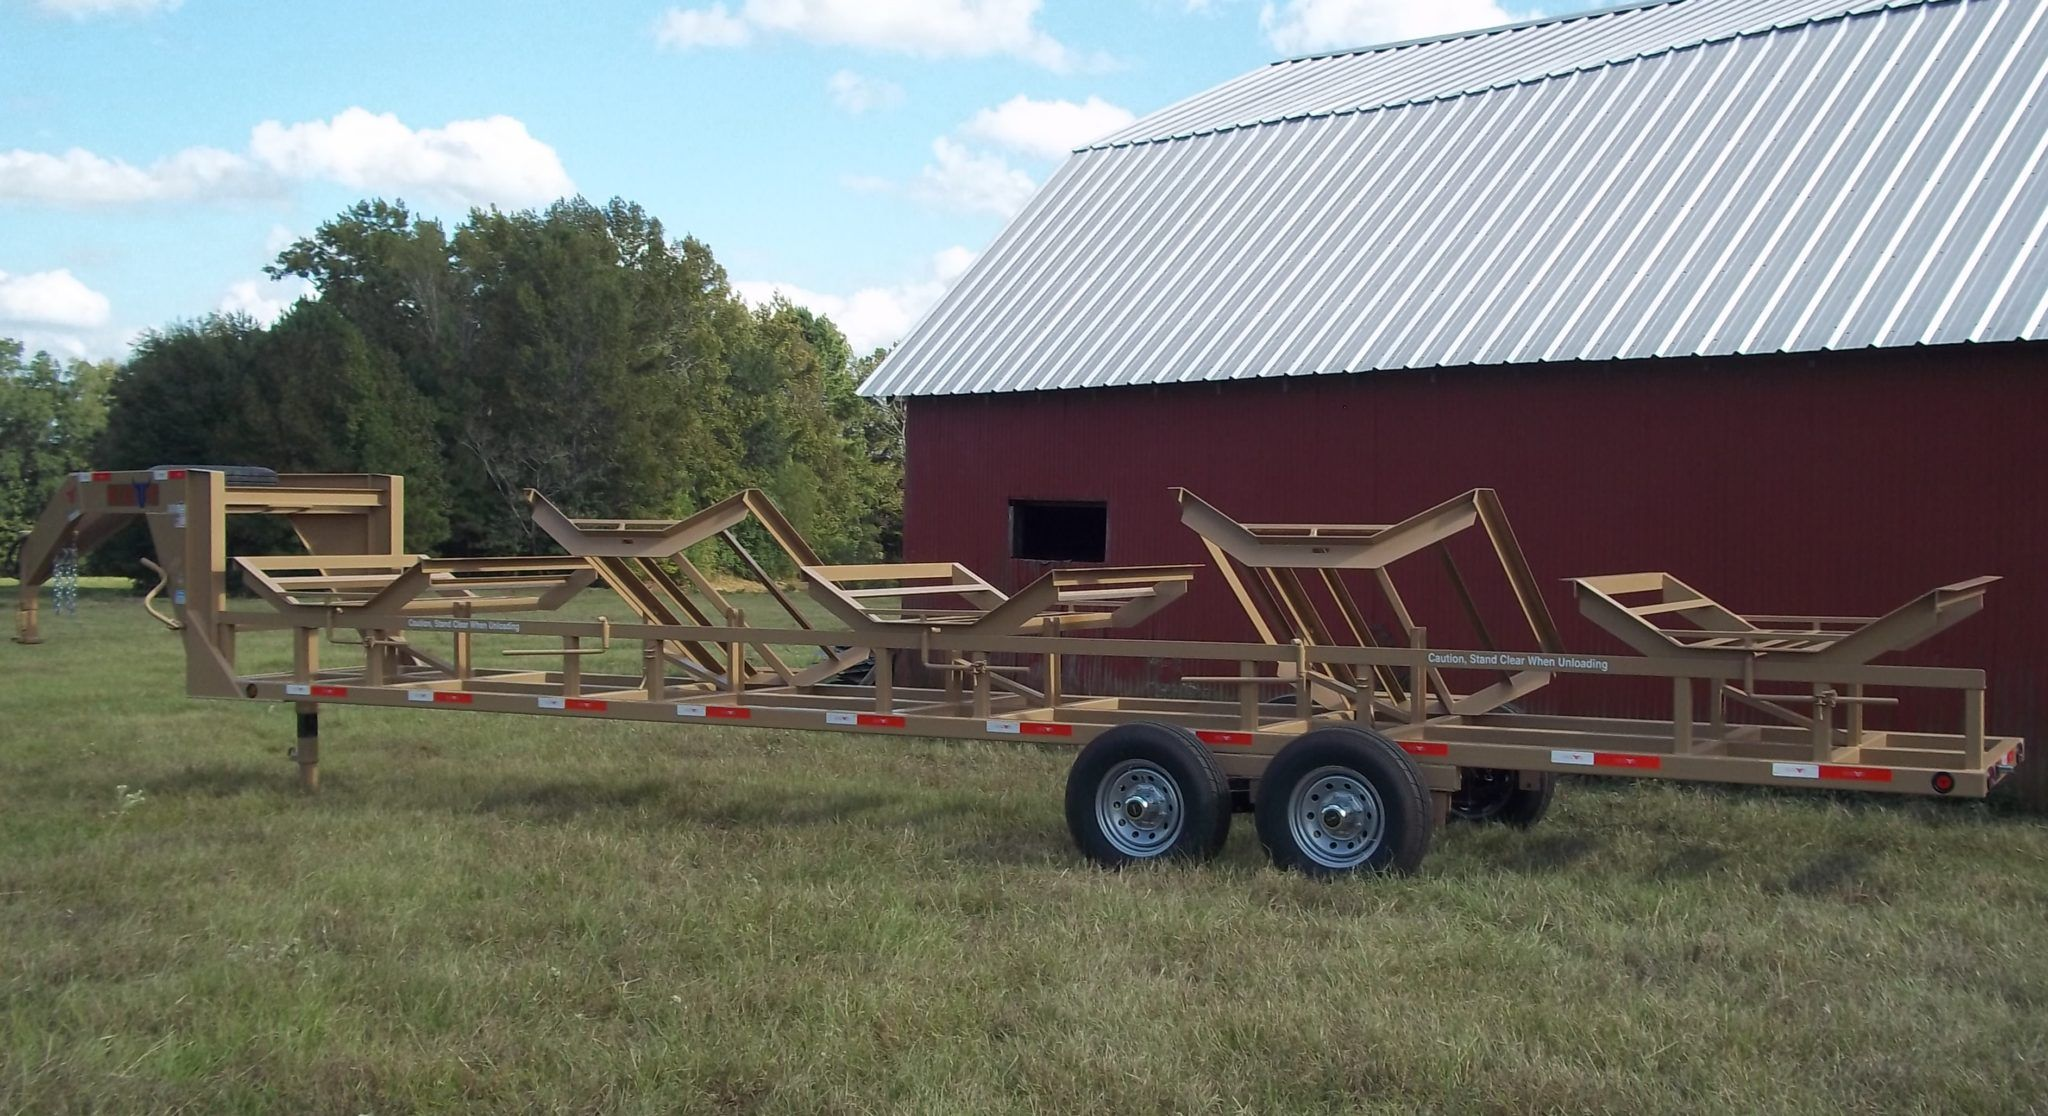 Neckover 5 Bale Hay Trailer Dump trailers, Custom